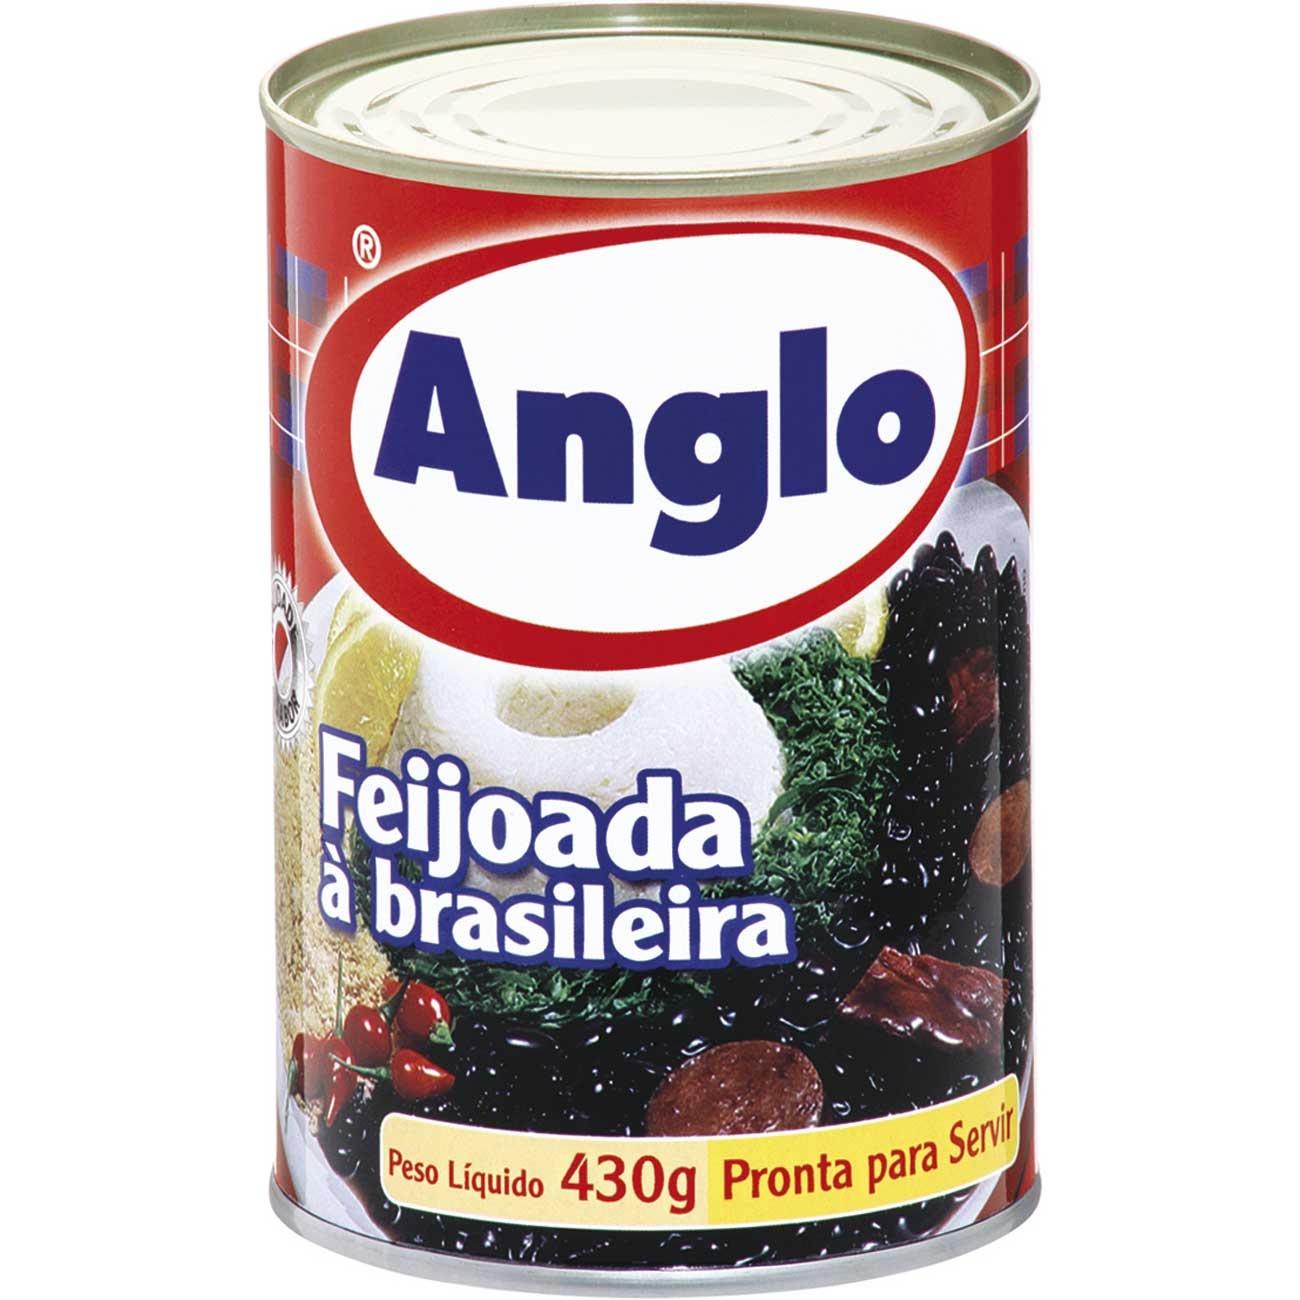 Feijoada Anglo � Brasileira Lata 430g | Caixa com 24 unidades